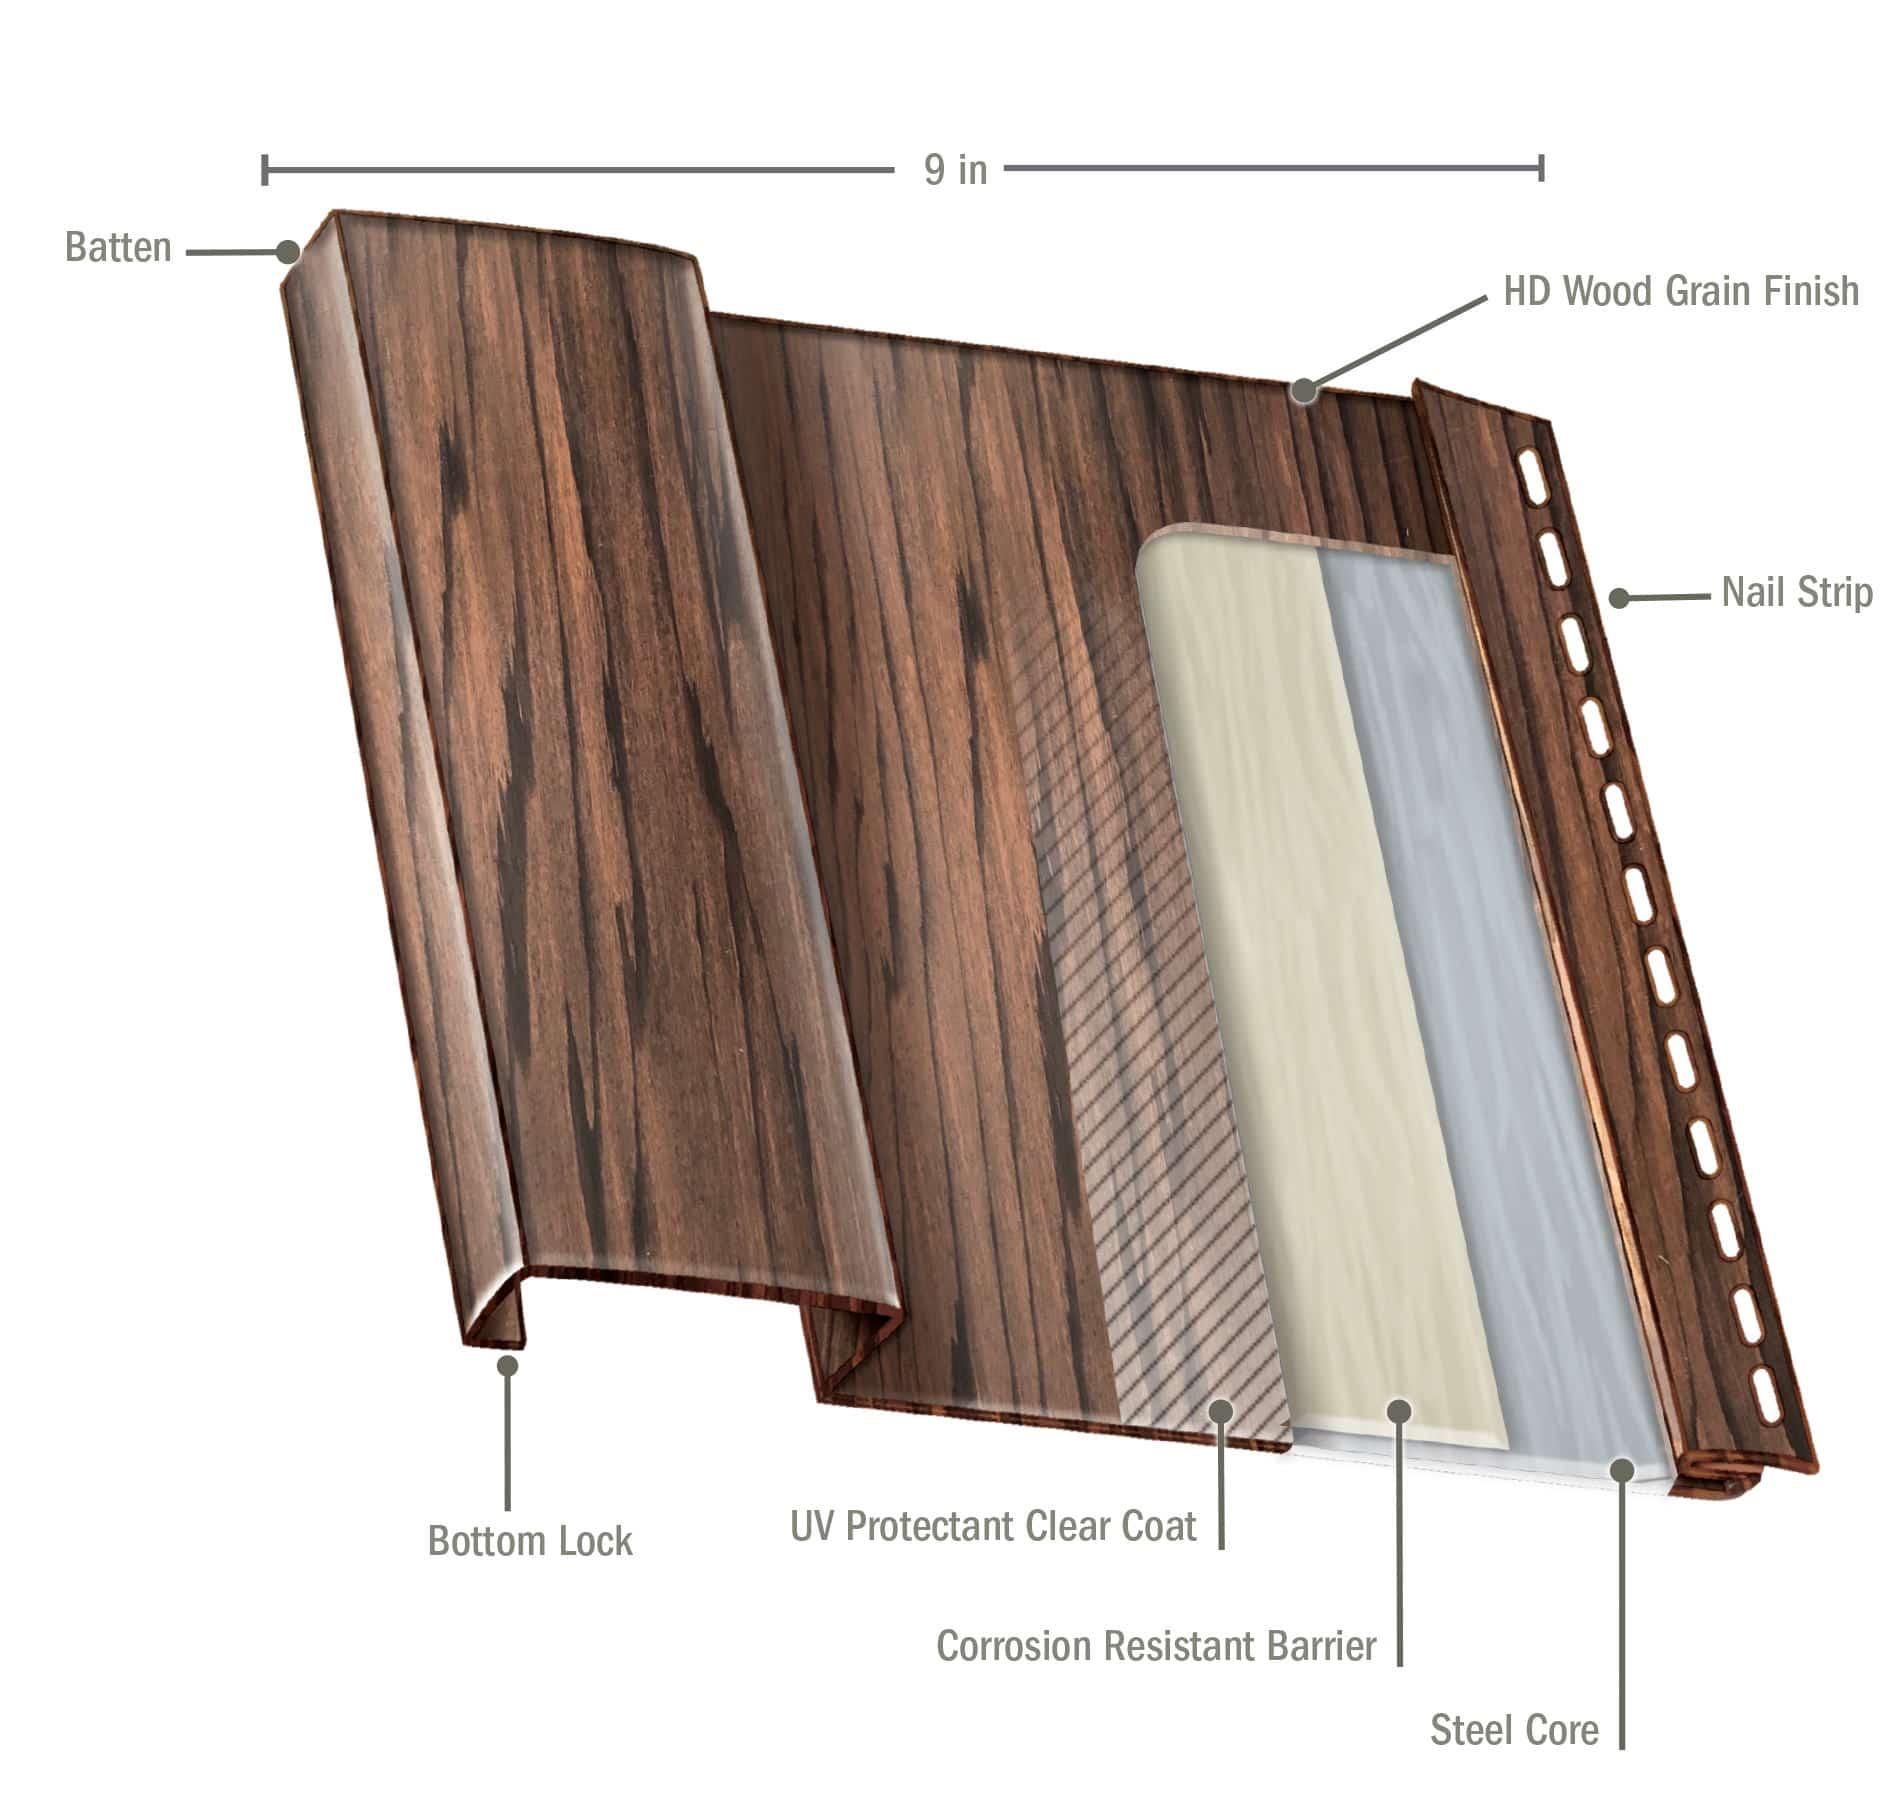 Board and Batten Steel Siding | TruLog Siding